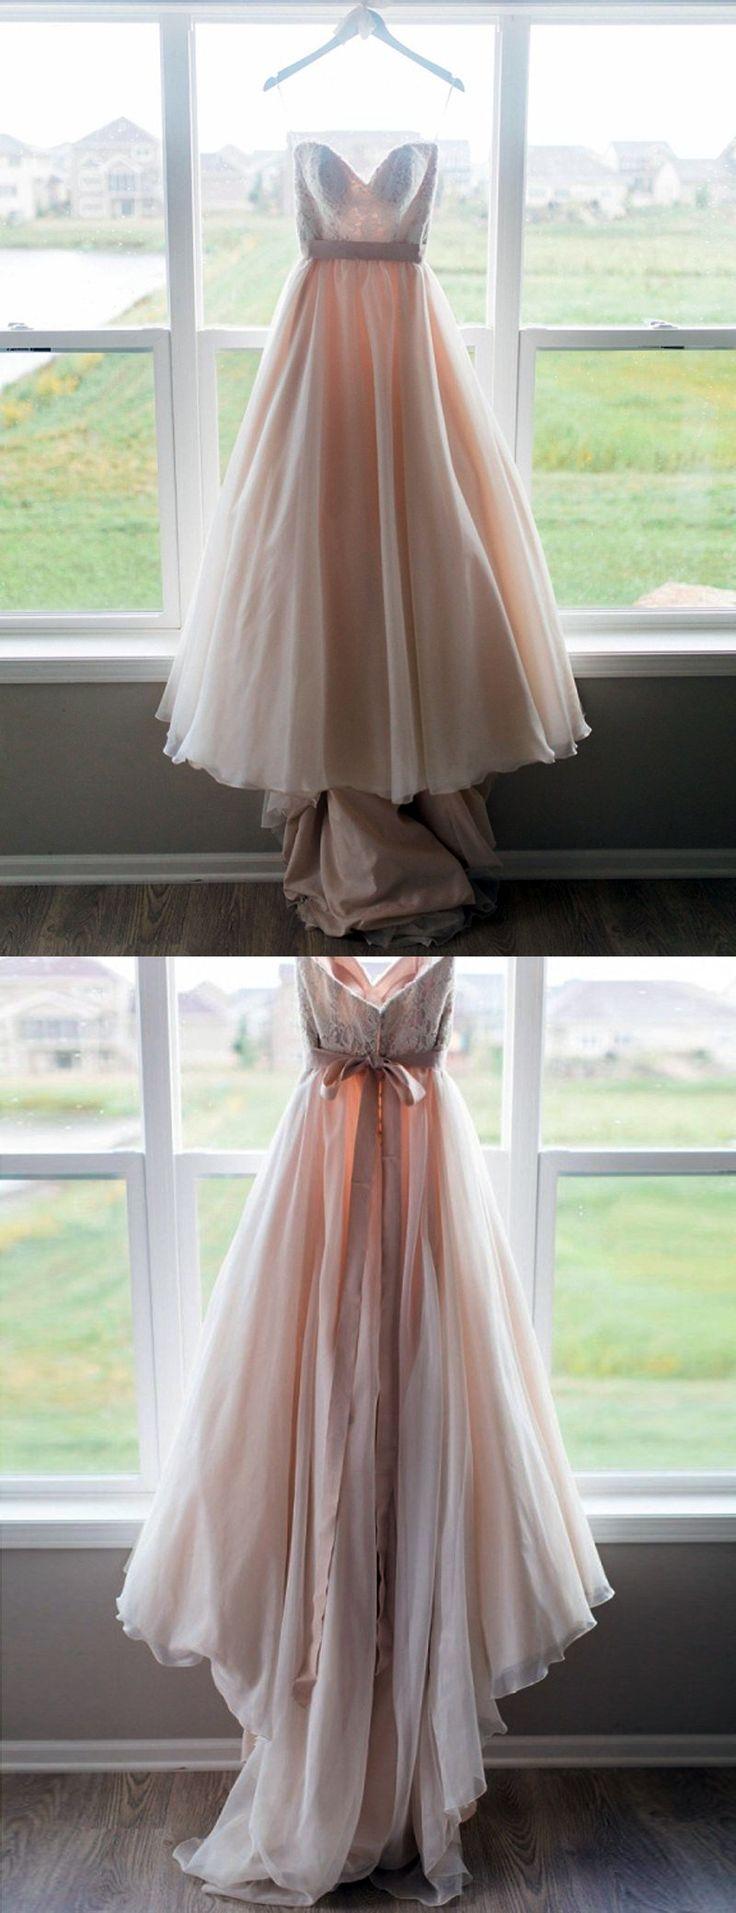 prom dresses, sweetheart prom gowns, elegant hi-low prom party dresses, long dresses